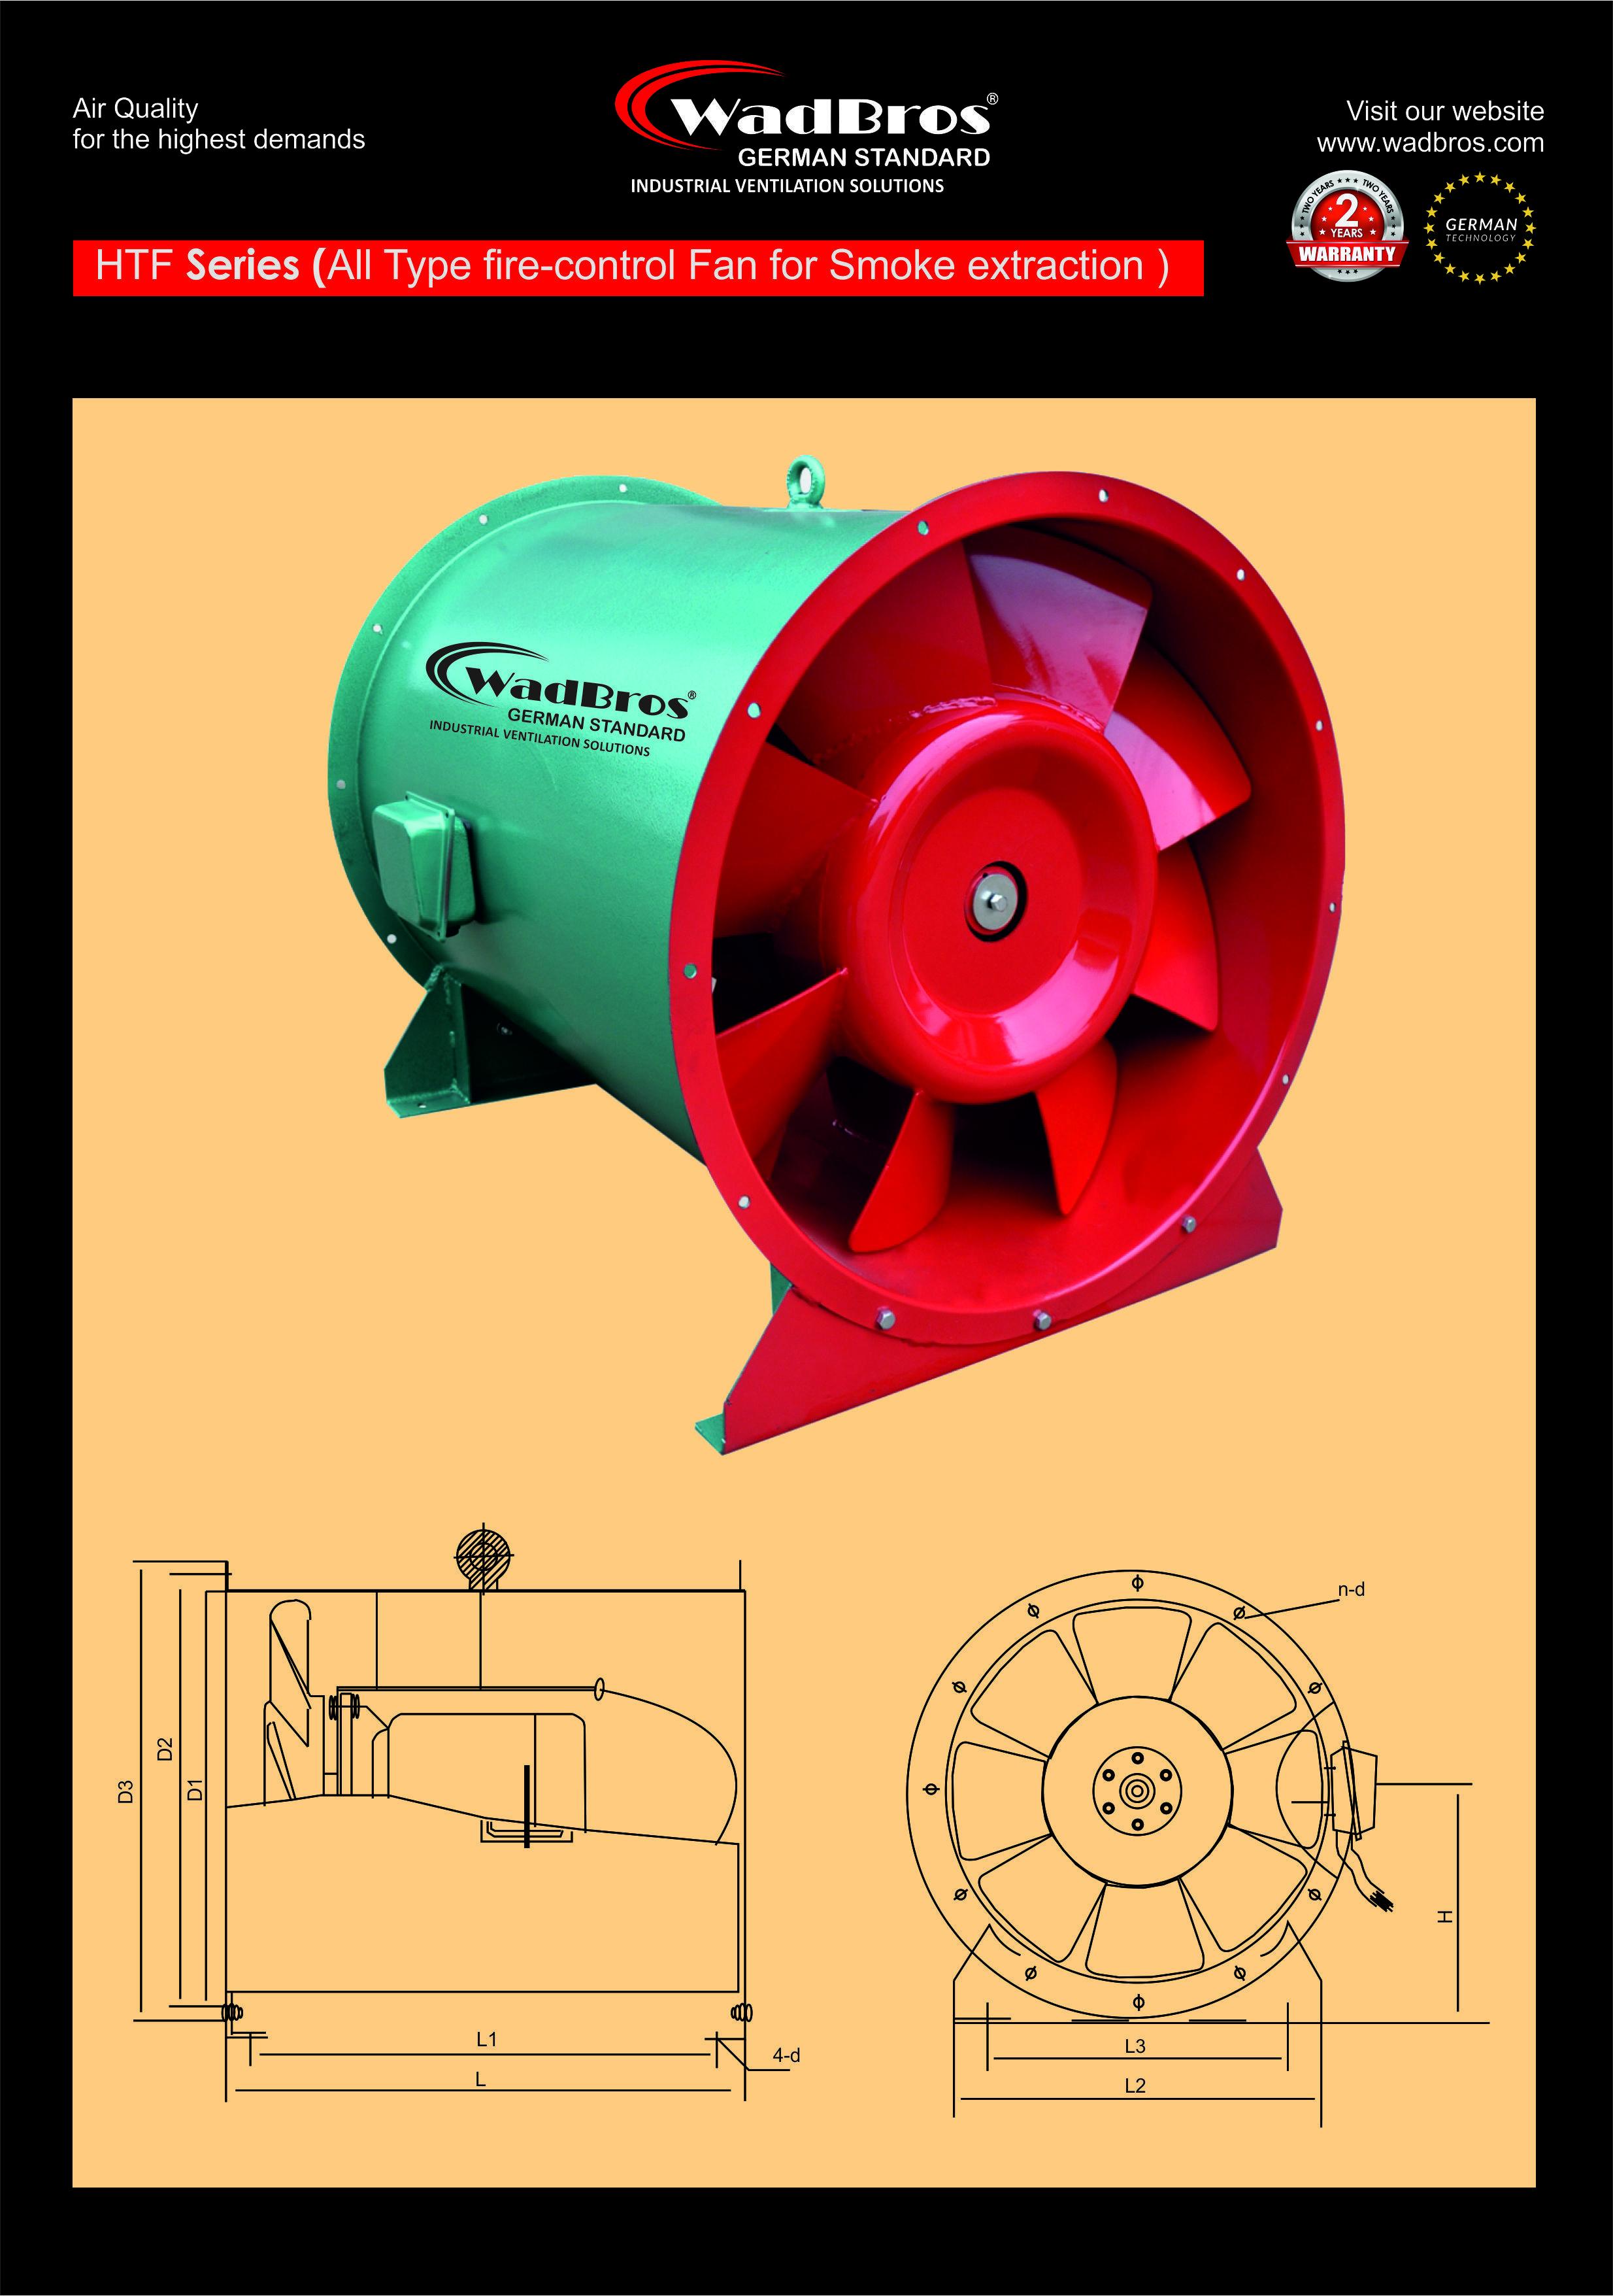 HTF Industrial Ventilation Fan ( All type Fan Fire - Control for Smoke Extraction )